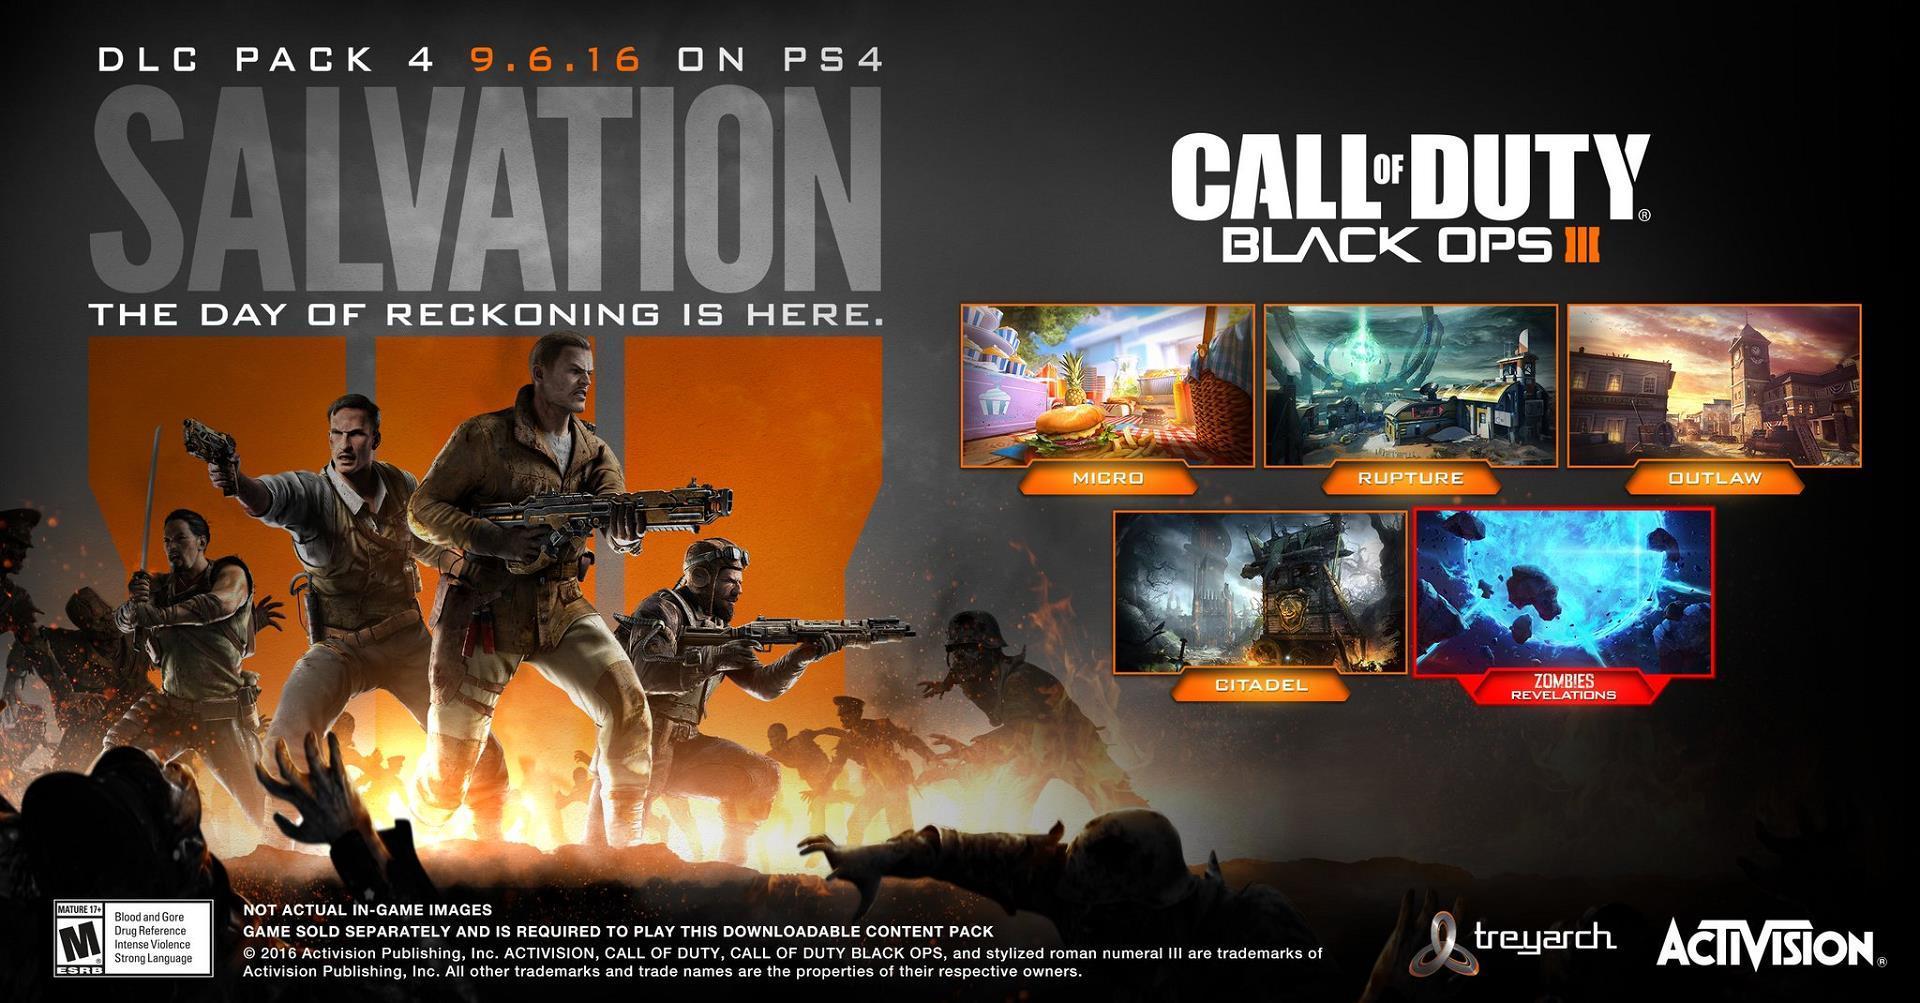 CALL OF DUTY BLACK OPS 3 SALVATION DLC + UPDATE 17 DOWNLOAD